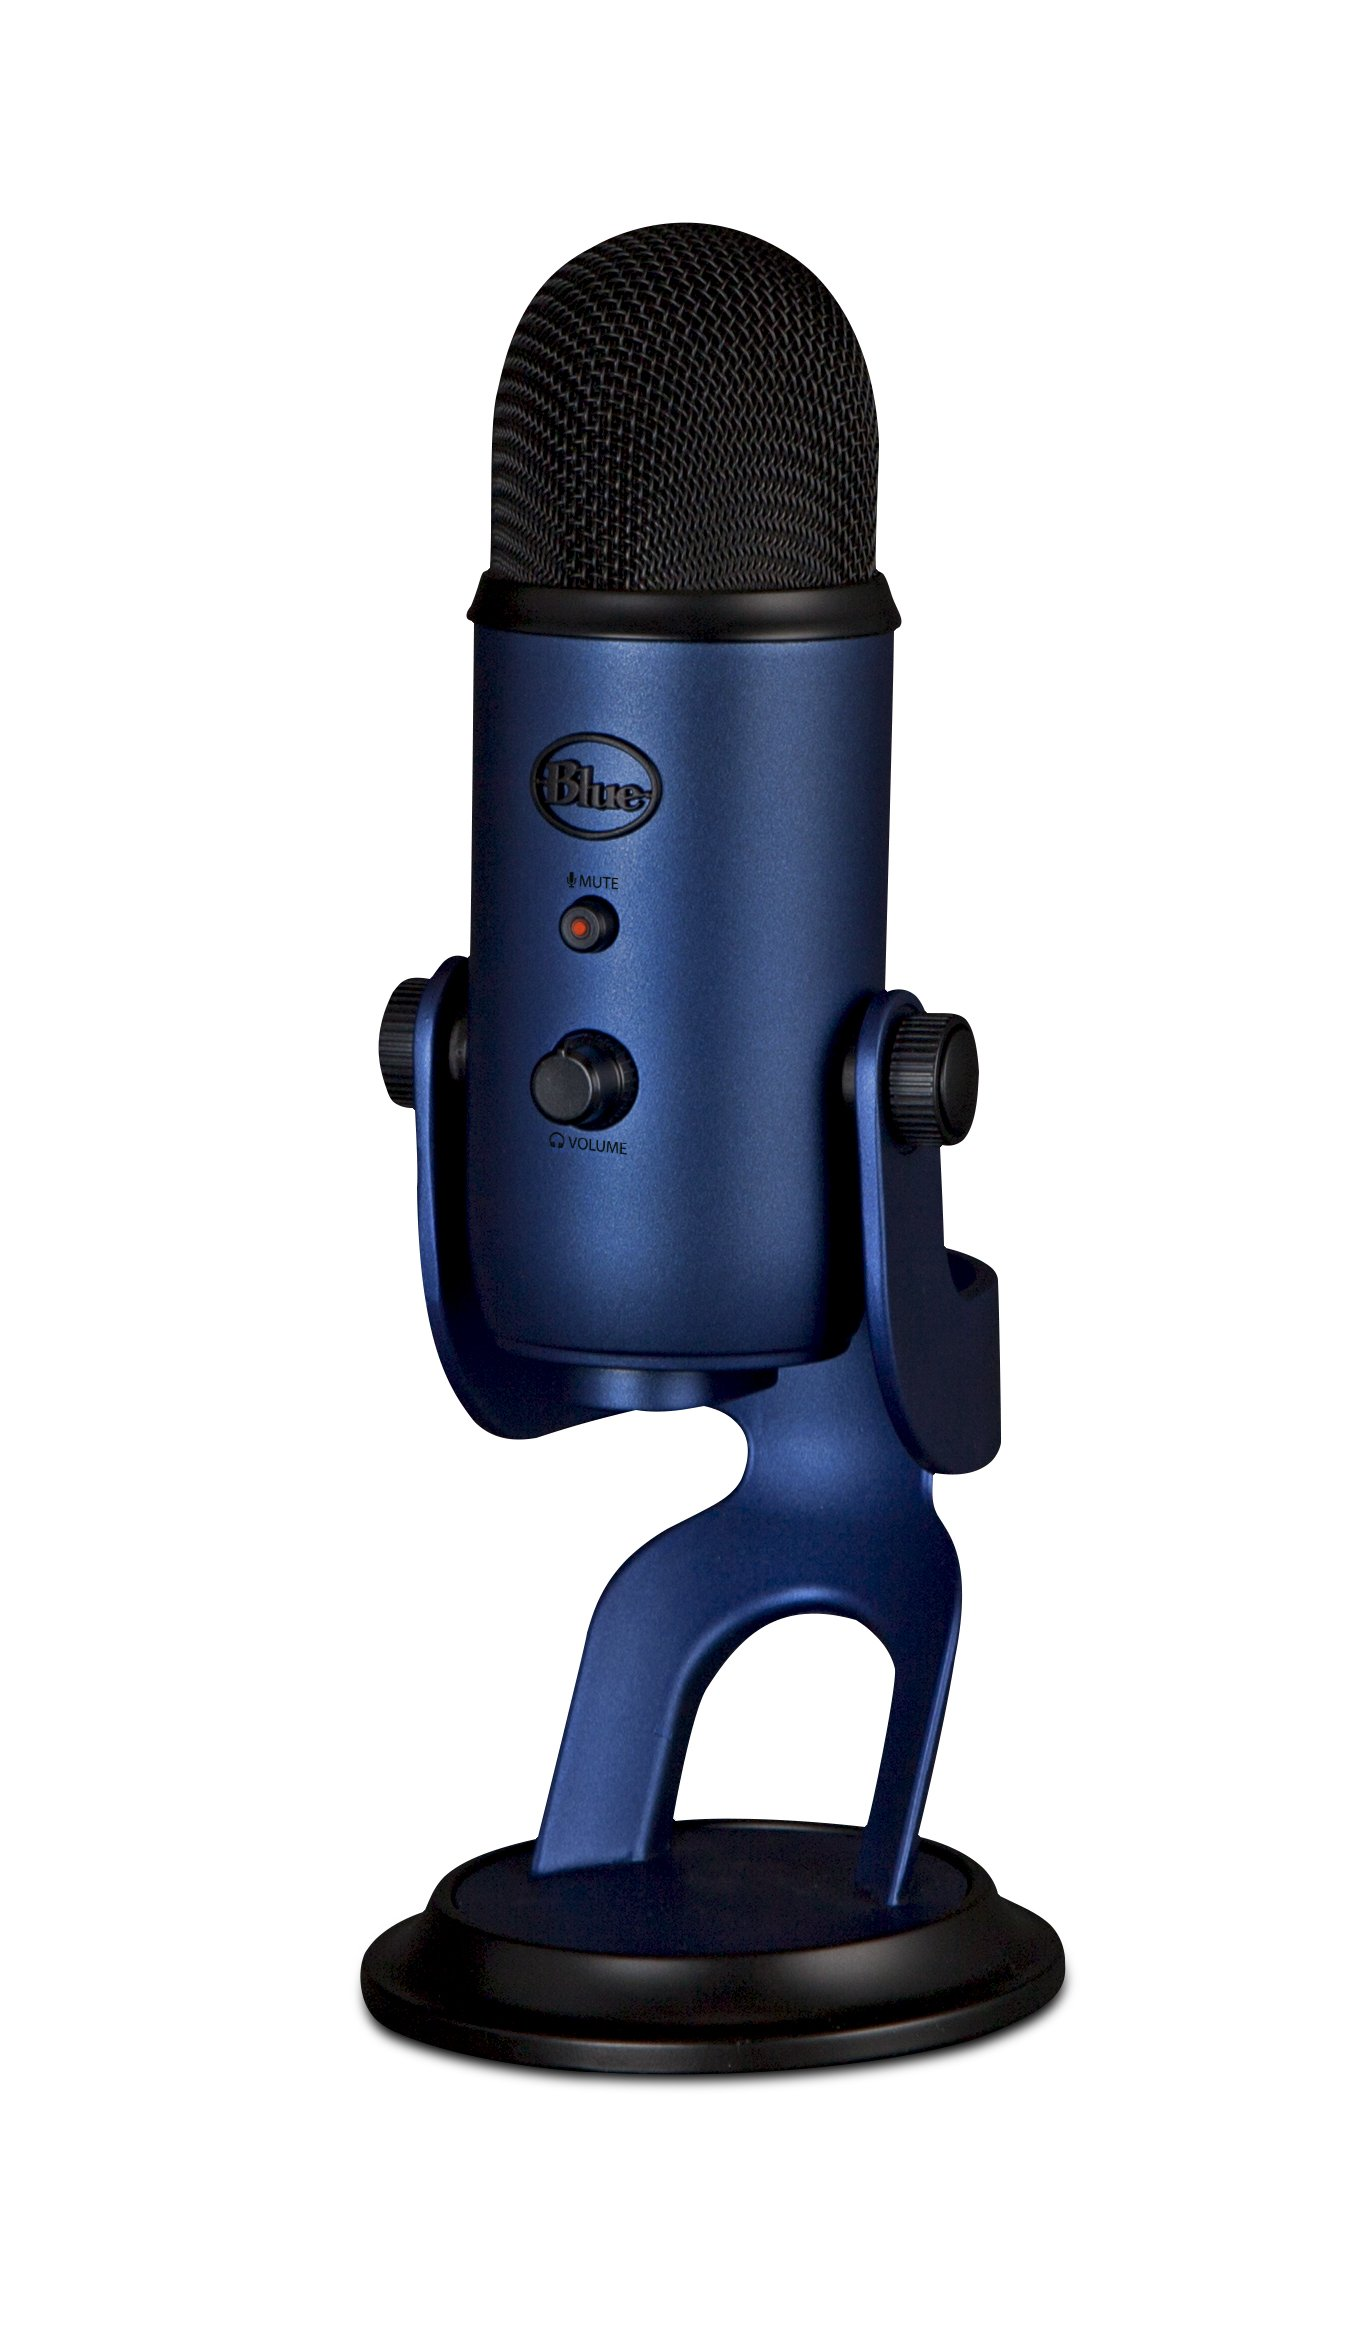 Blue Yeti USB Microphone - Midnight Blue